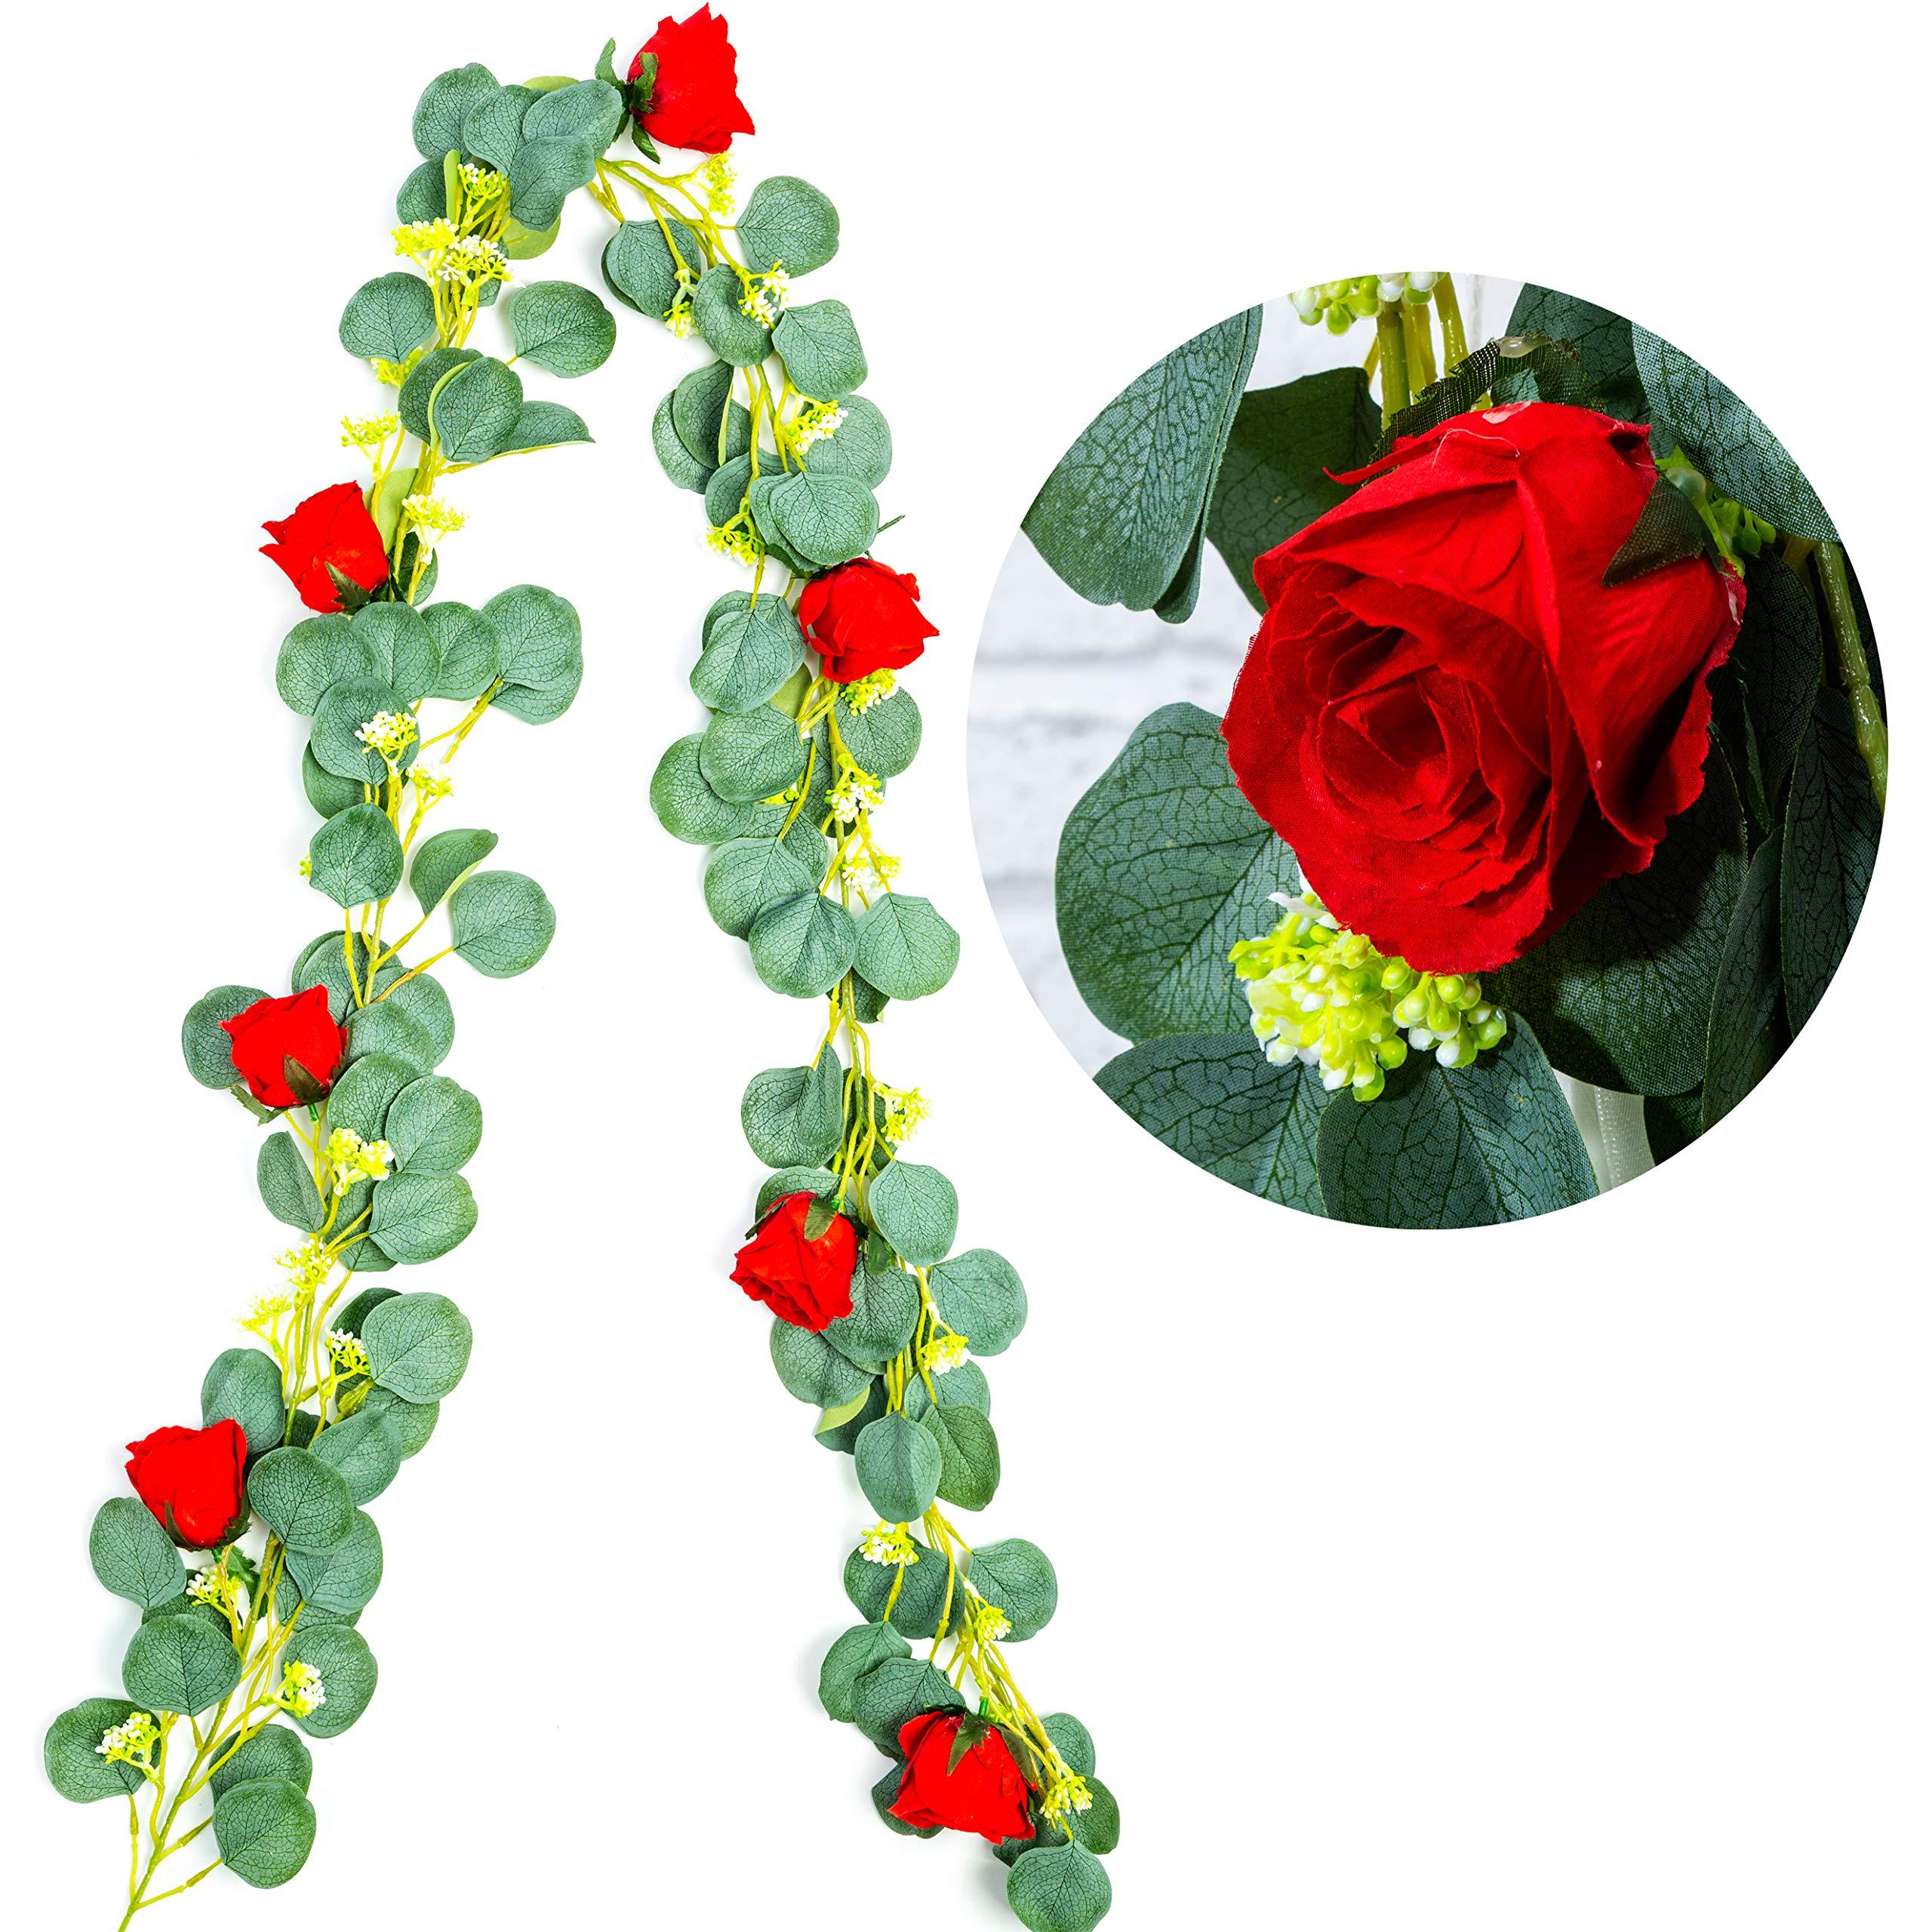 HEJIAYI Artificial Rose Vine Flower Garland Silk Faux Eucalyptus Garland Greenery Eucalyptus Leaves Wedding Backdrop Arch Wall Decor (2, Red Rose)